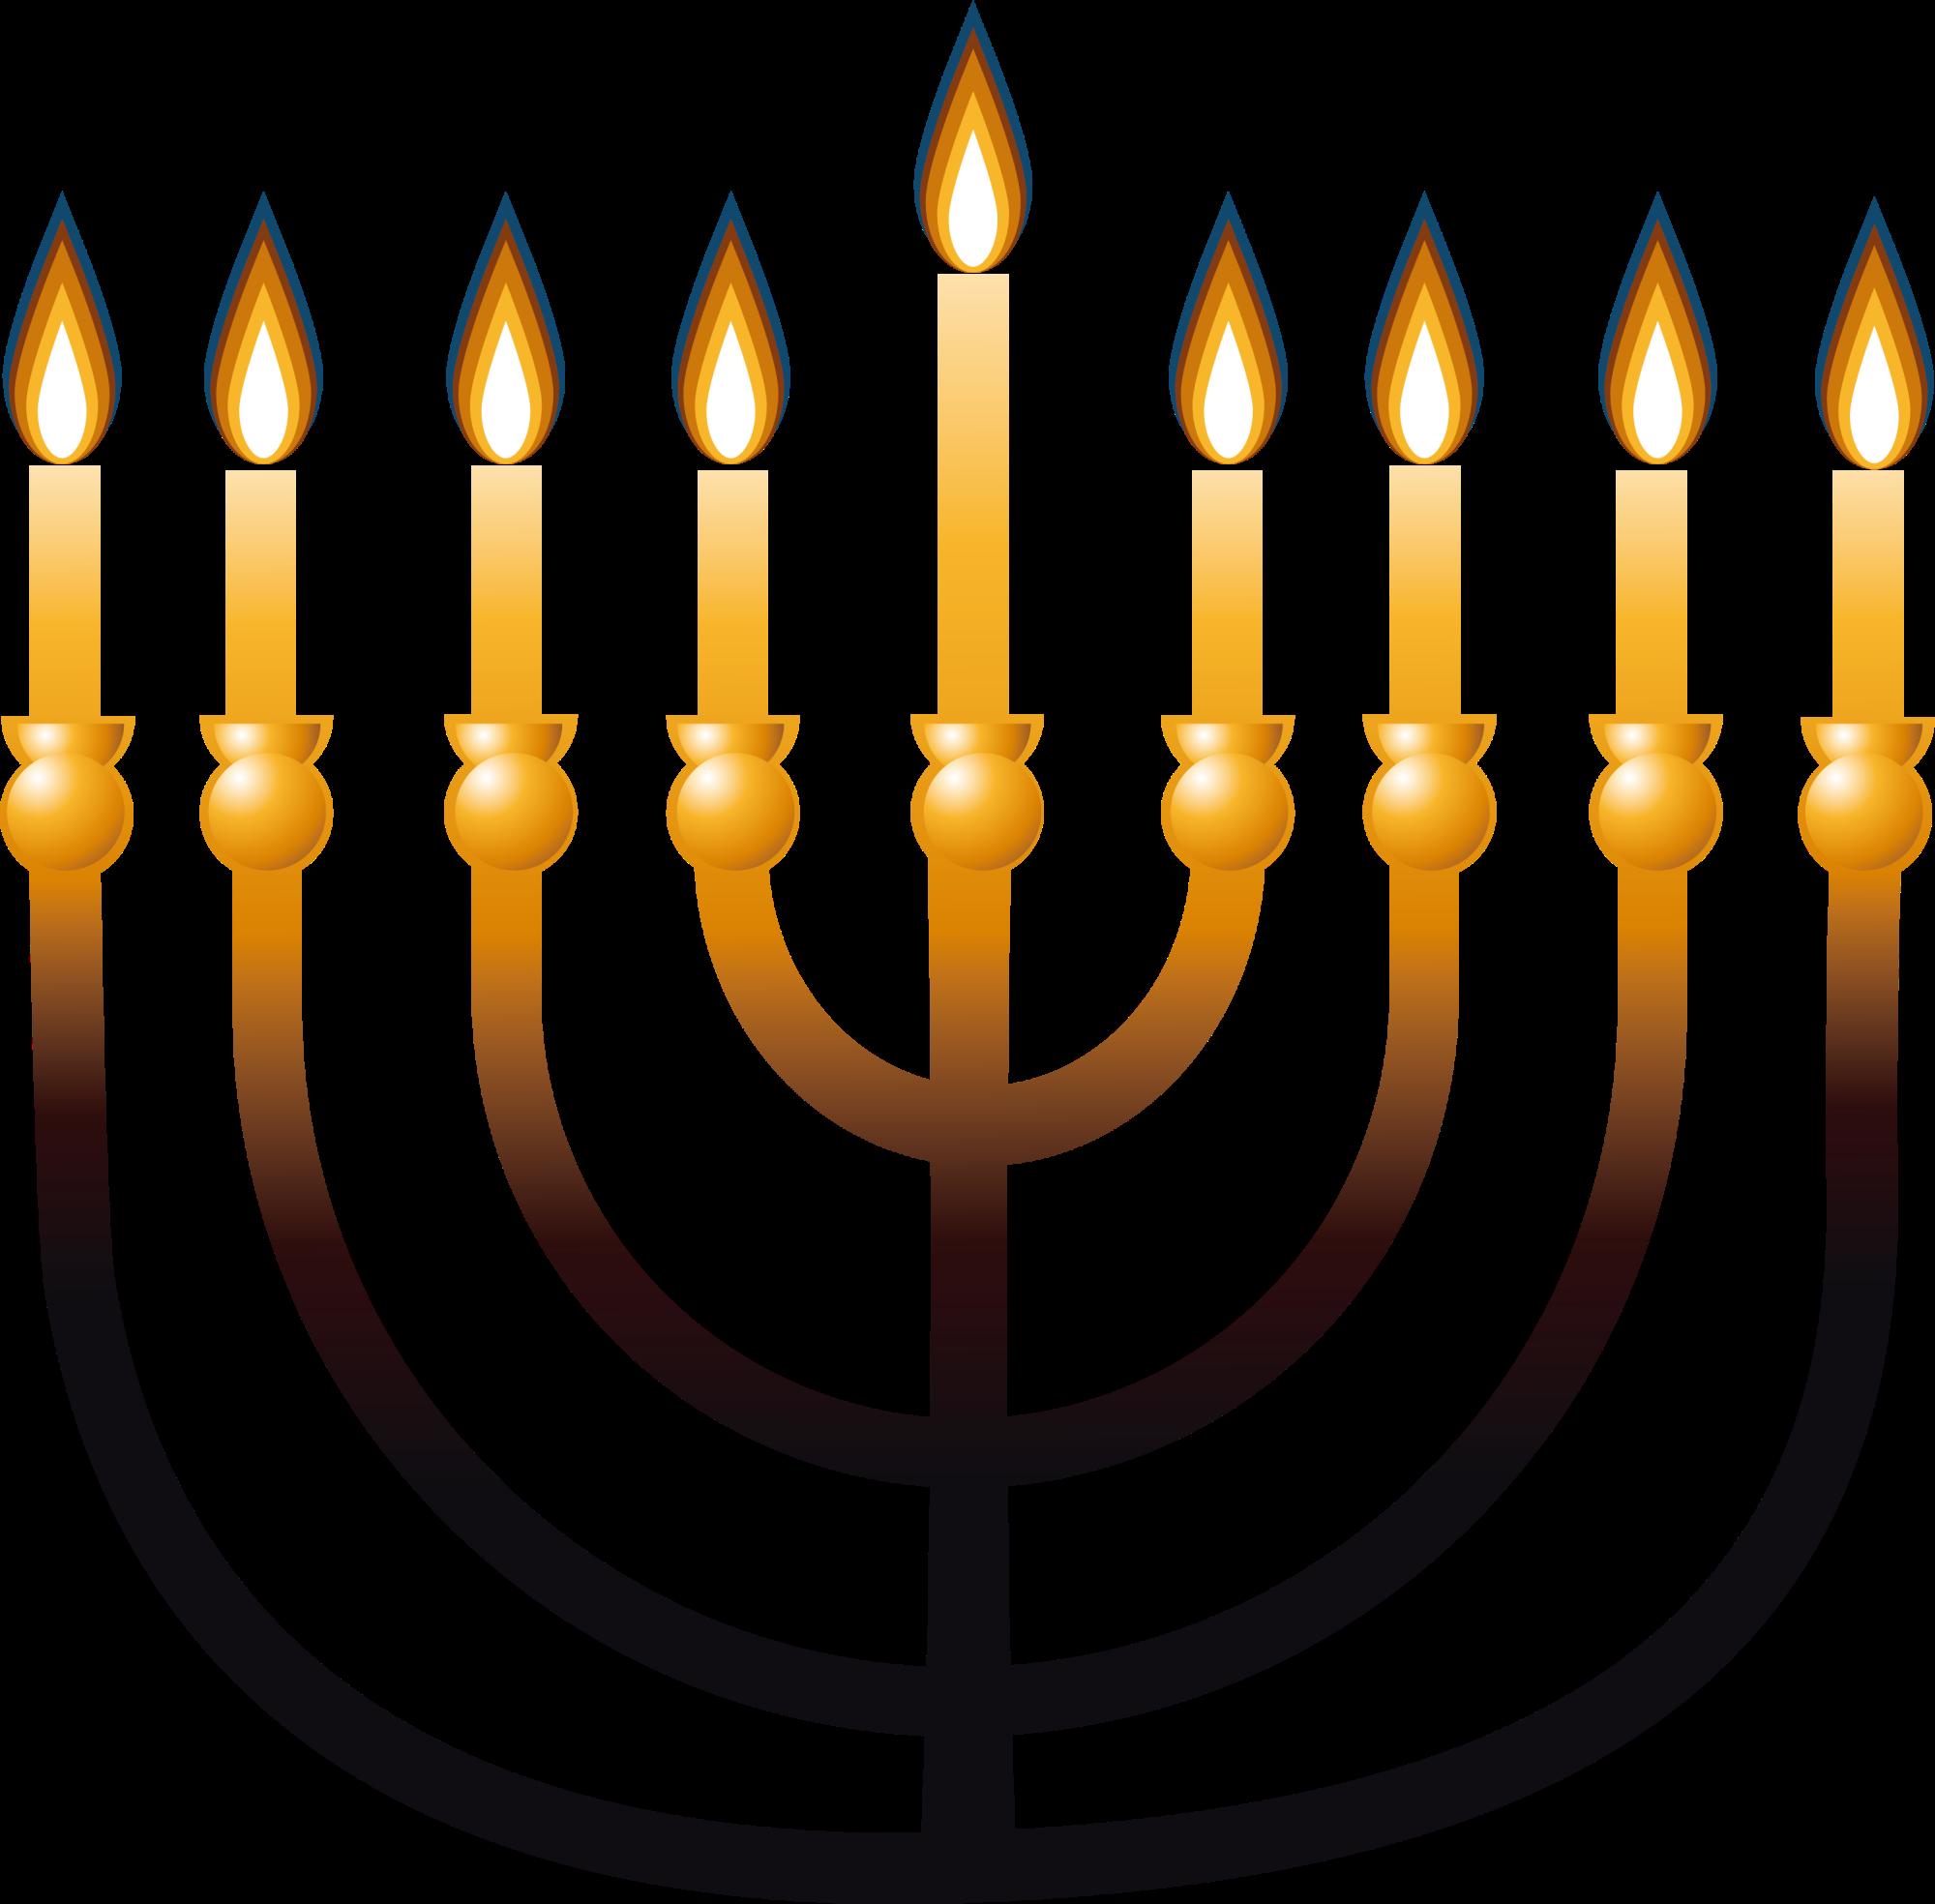 Menorah jewish people candle. Decoration clipart hanukkah